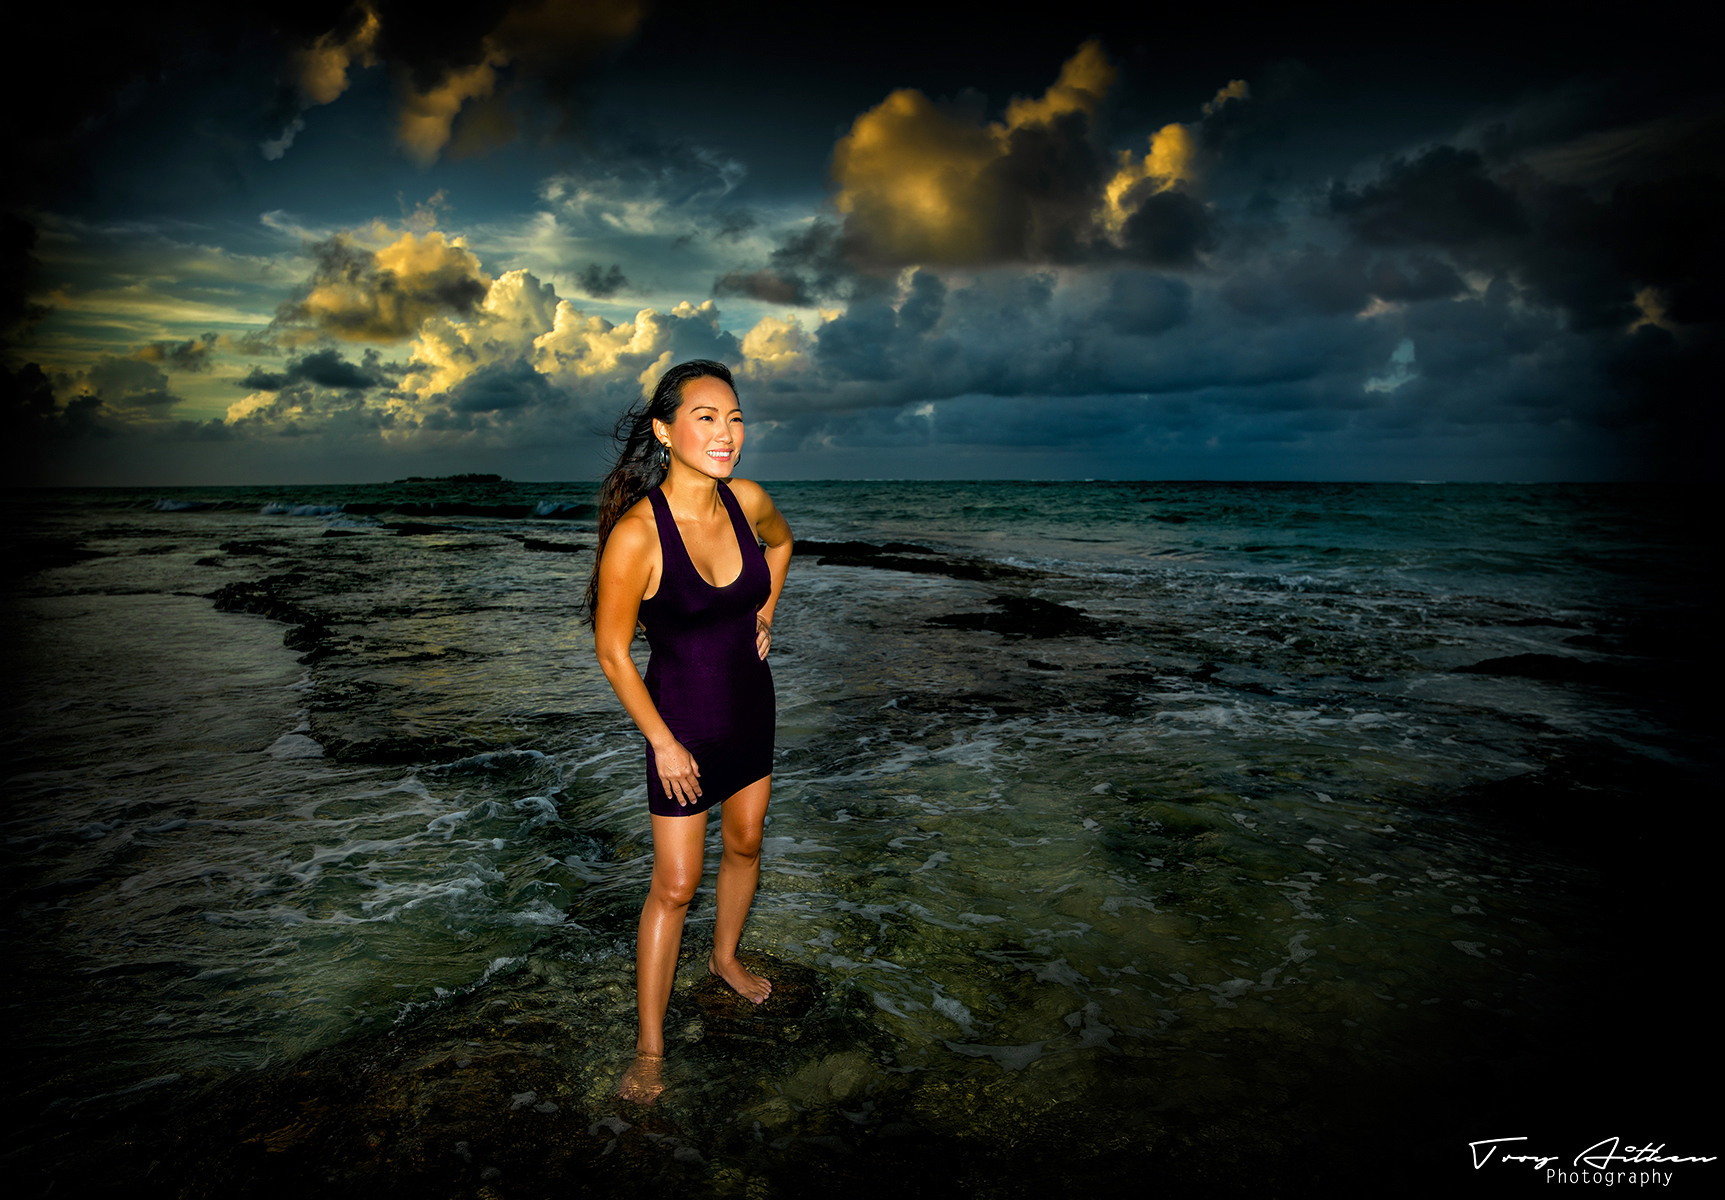 Troy Aitken Photography - Portfolio